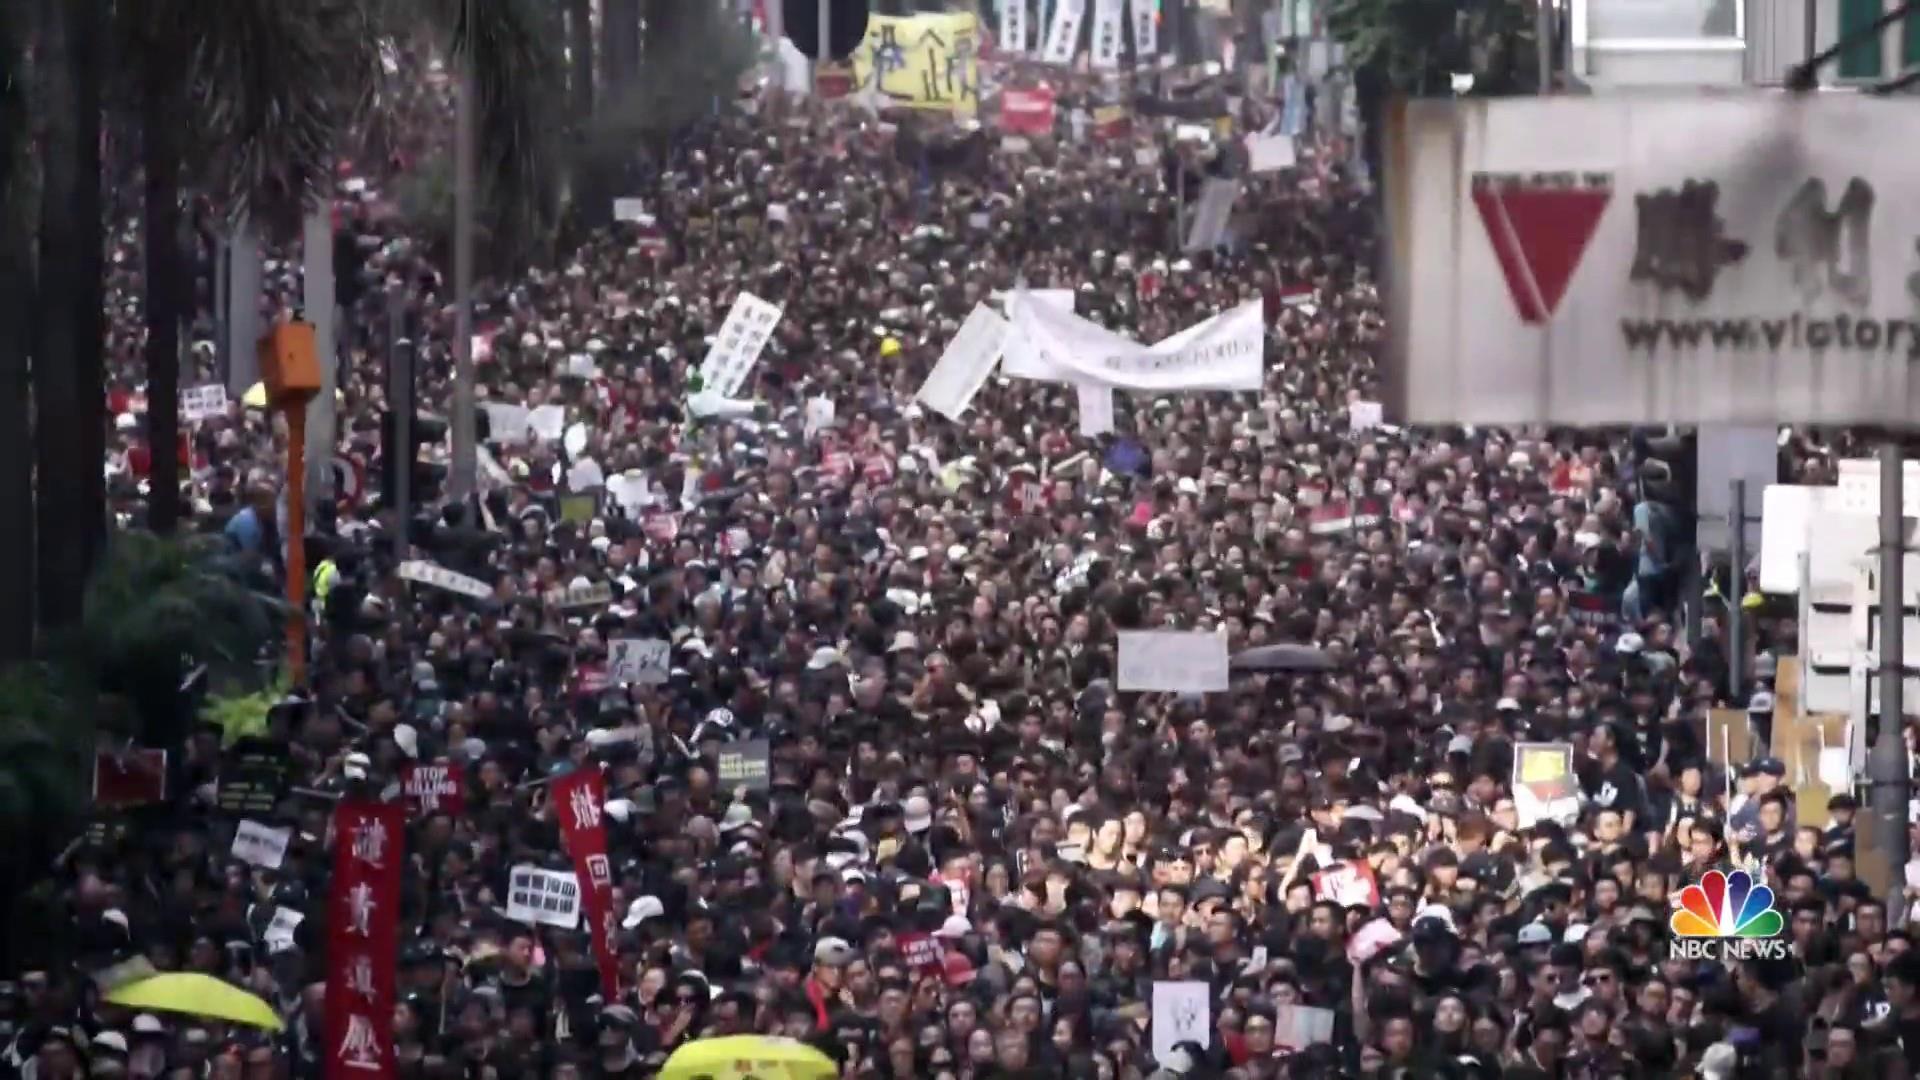 Hong Kong demonstrators demand permanent end to extradition bill